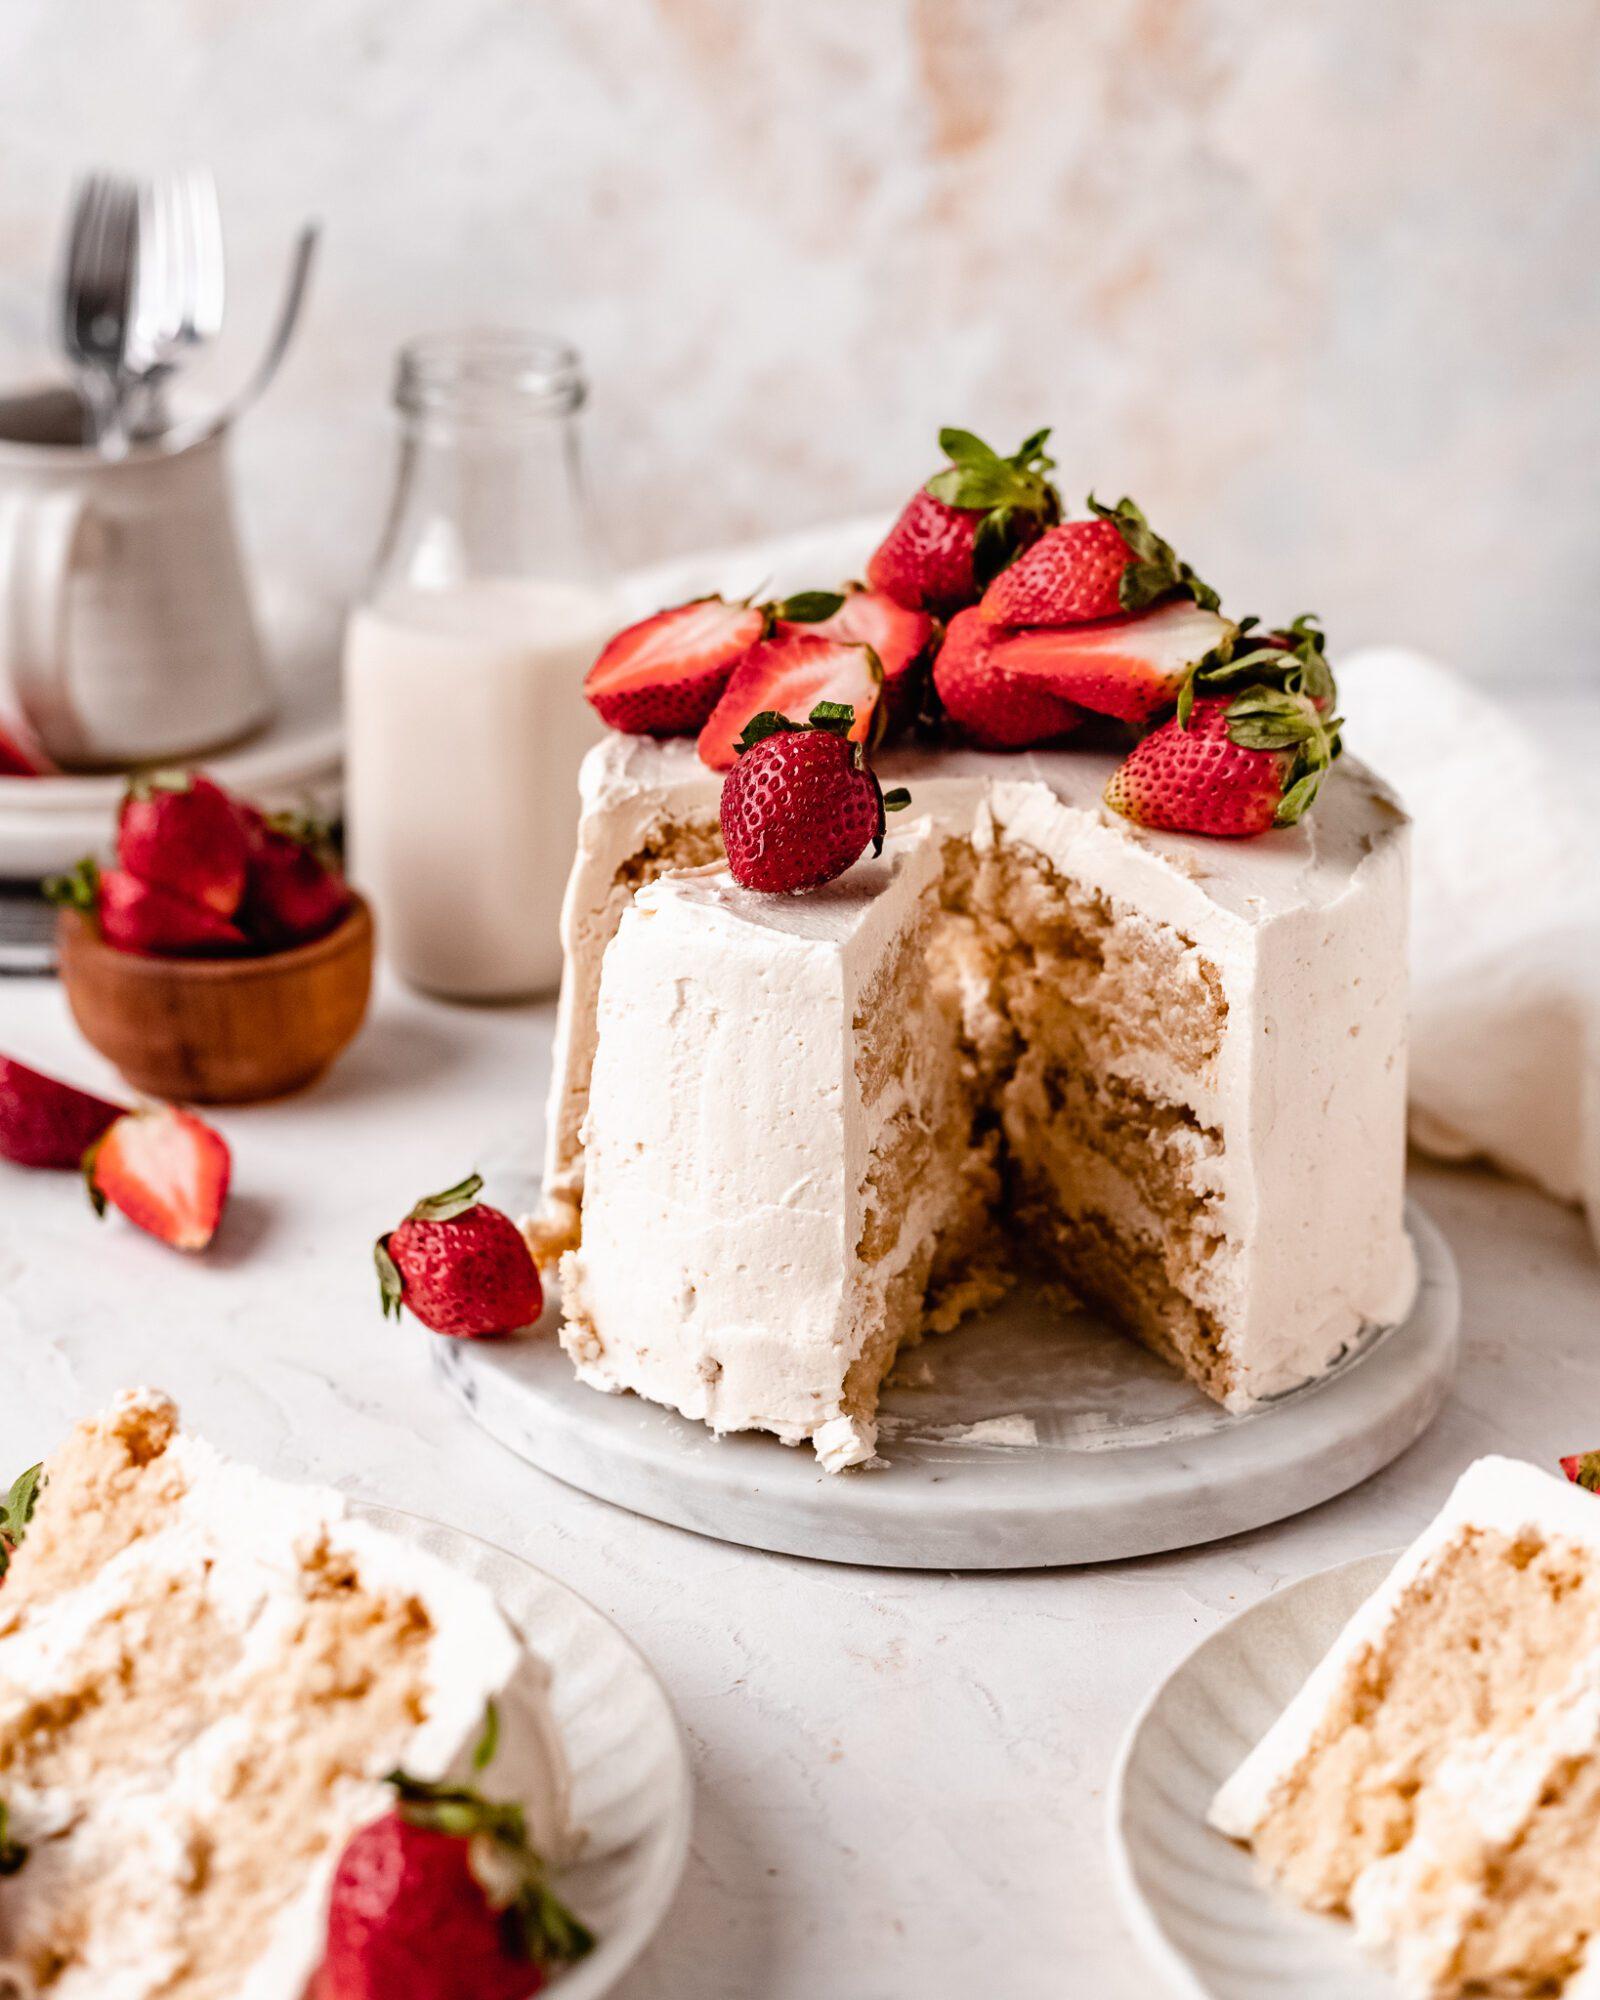 Easy Strawberry Vanilla Chiffon Cake Recipe Eggless The Banana Diaries